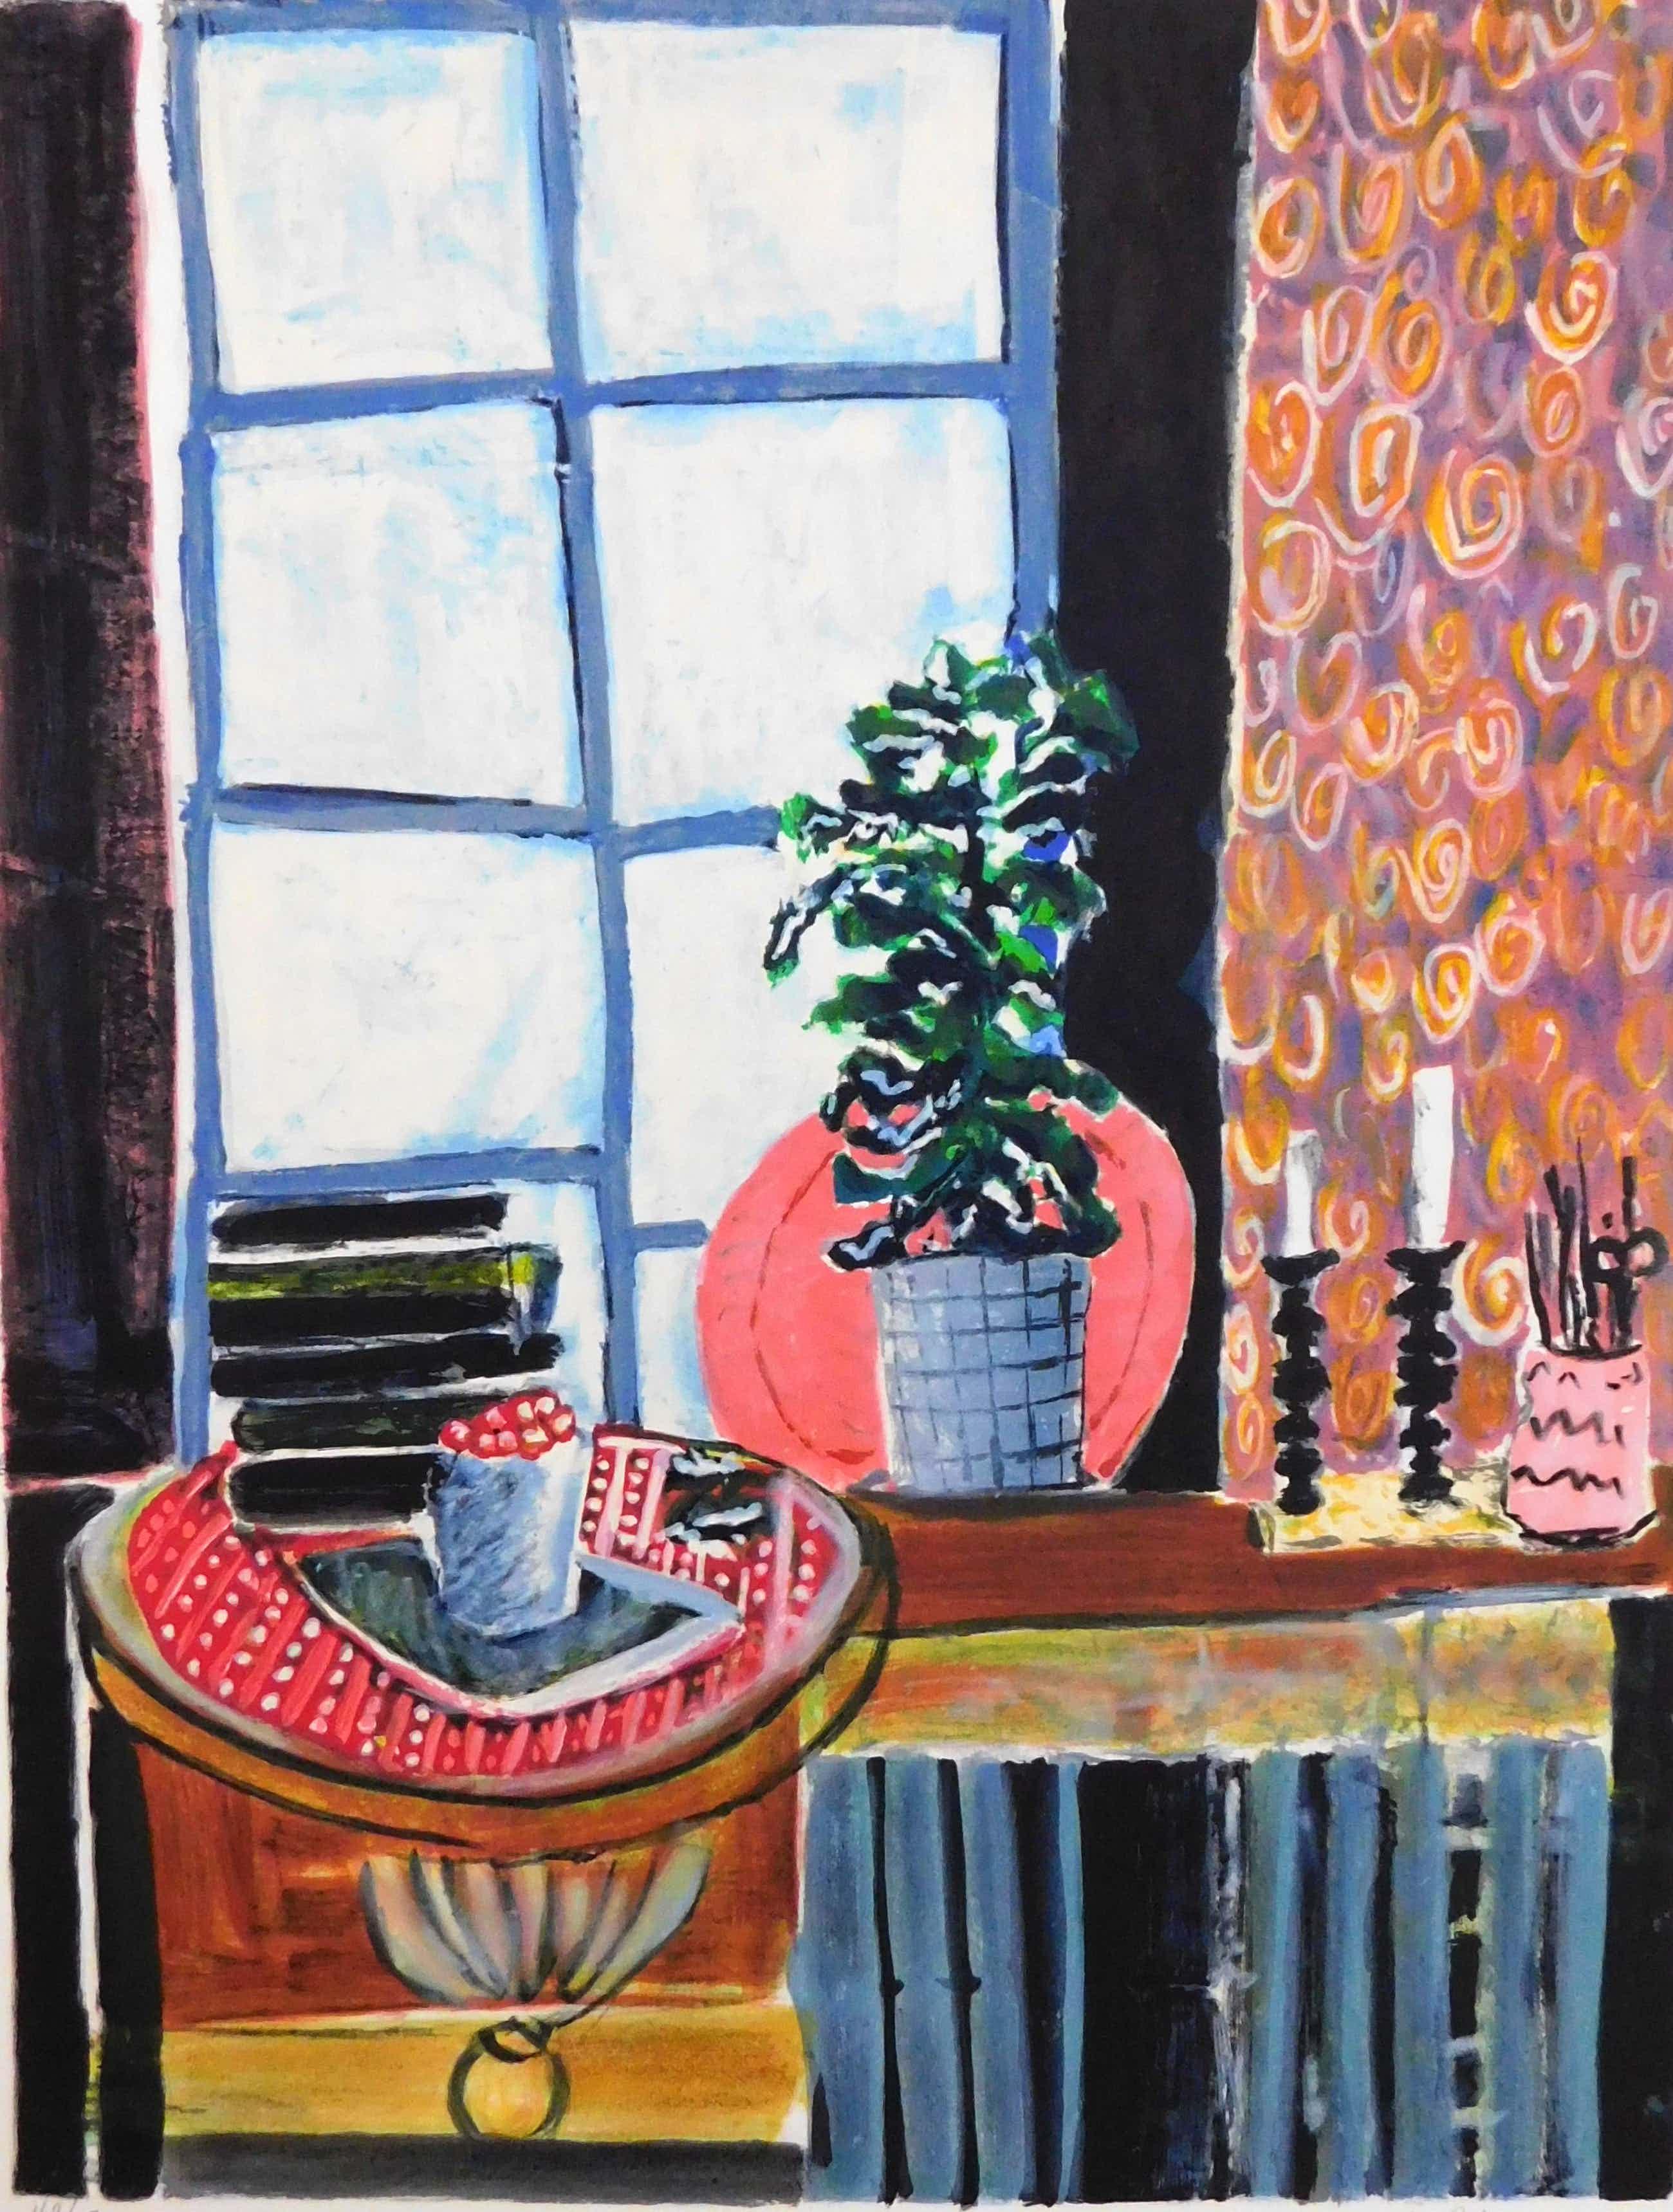 Wendy Chazin - Still-life with Candlesticks kopen? Bied vanaf 60!